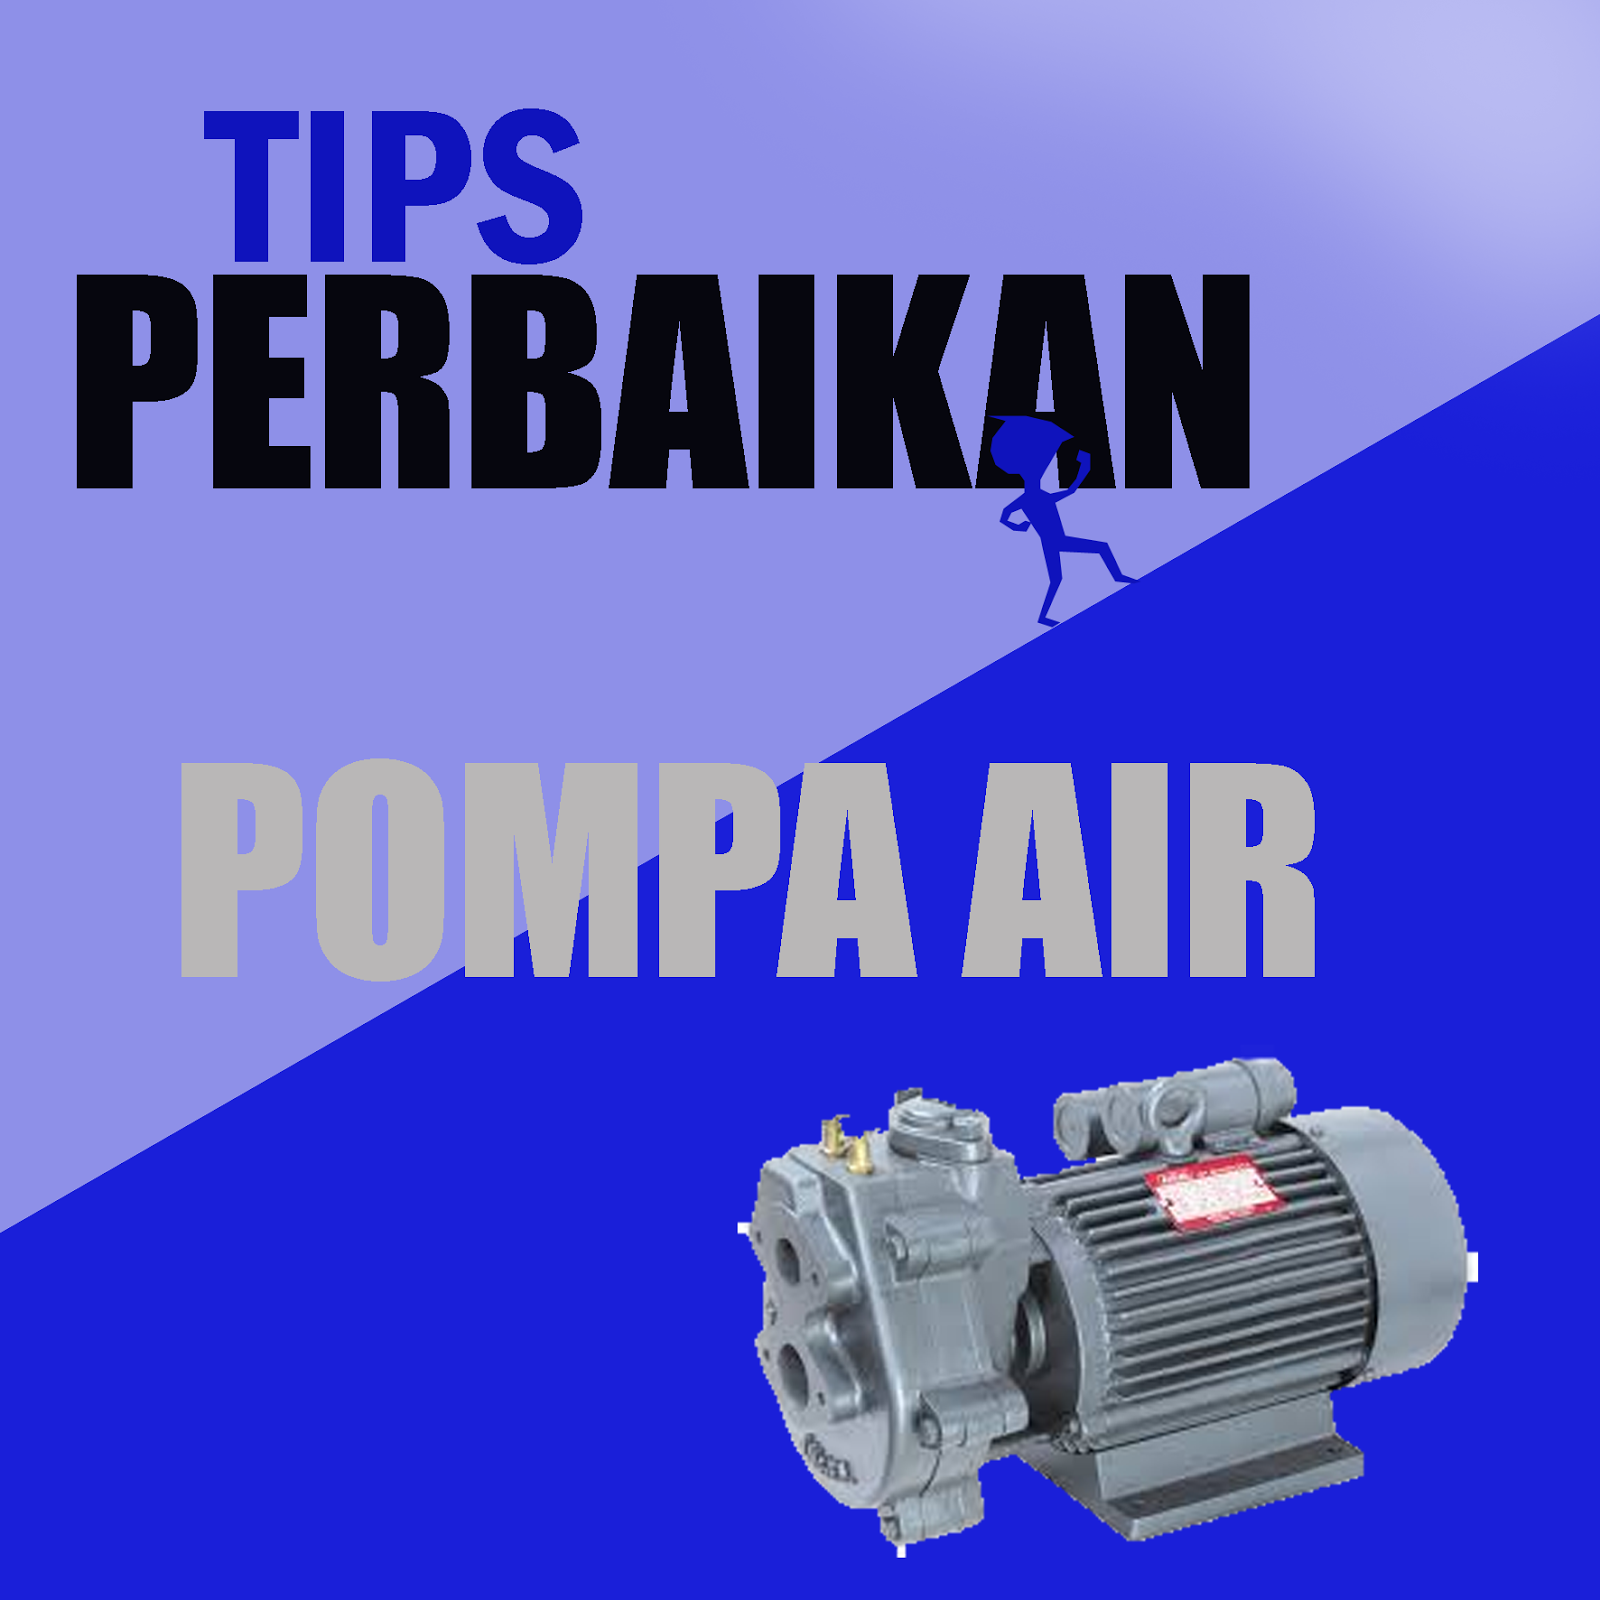 Pompa Air Rusak Tuntaskan Dengan 8 Tips Perbaikan Pompa Air Sampai Berfungsi Kembali Part 2 Wijdan Kelistrikan